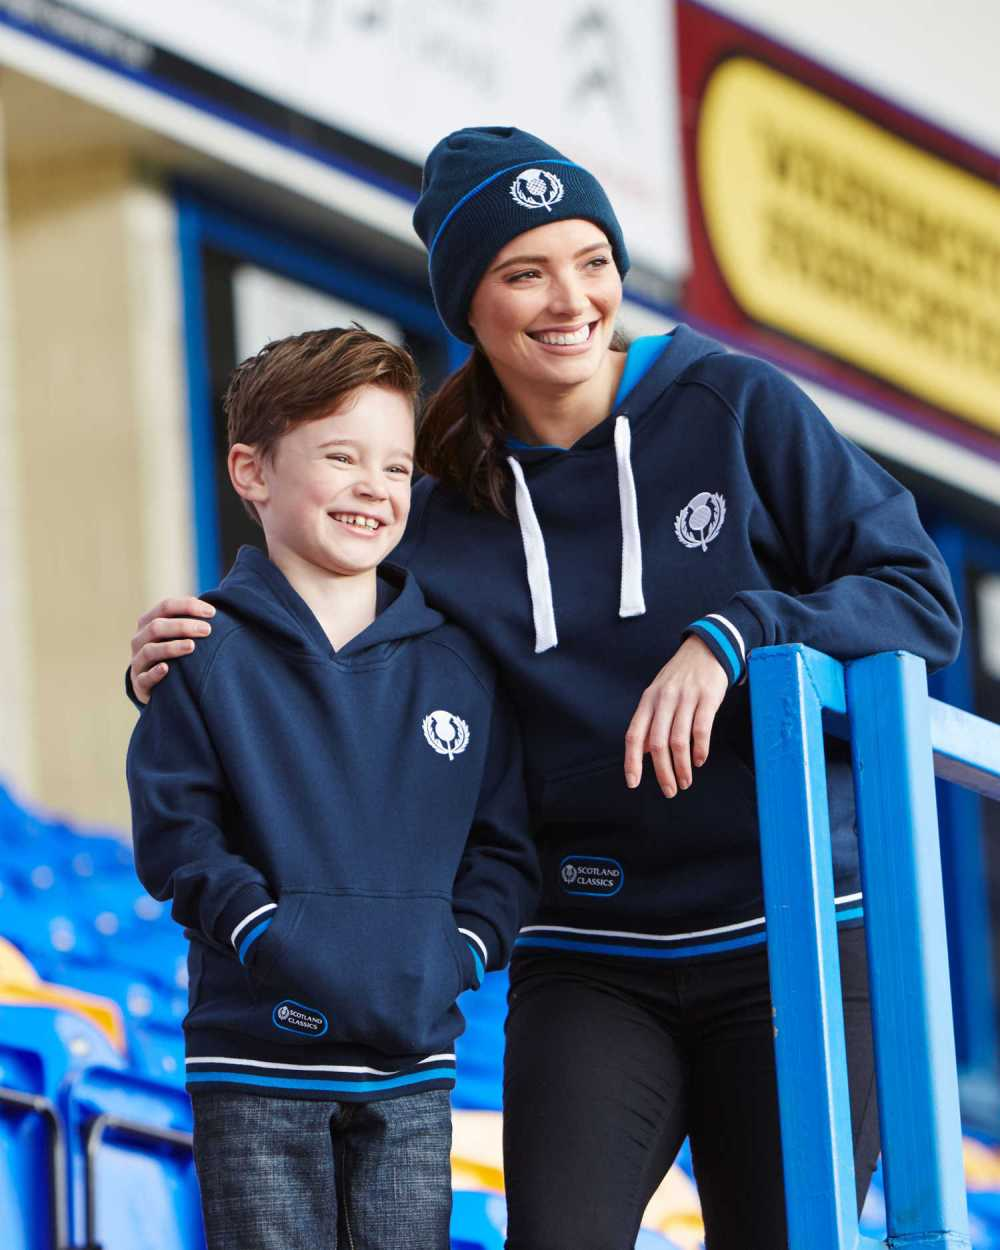 Ricco Miskimmon - Children's-Rugby-Hoody-Scotland-C